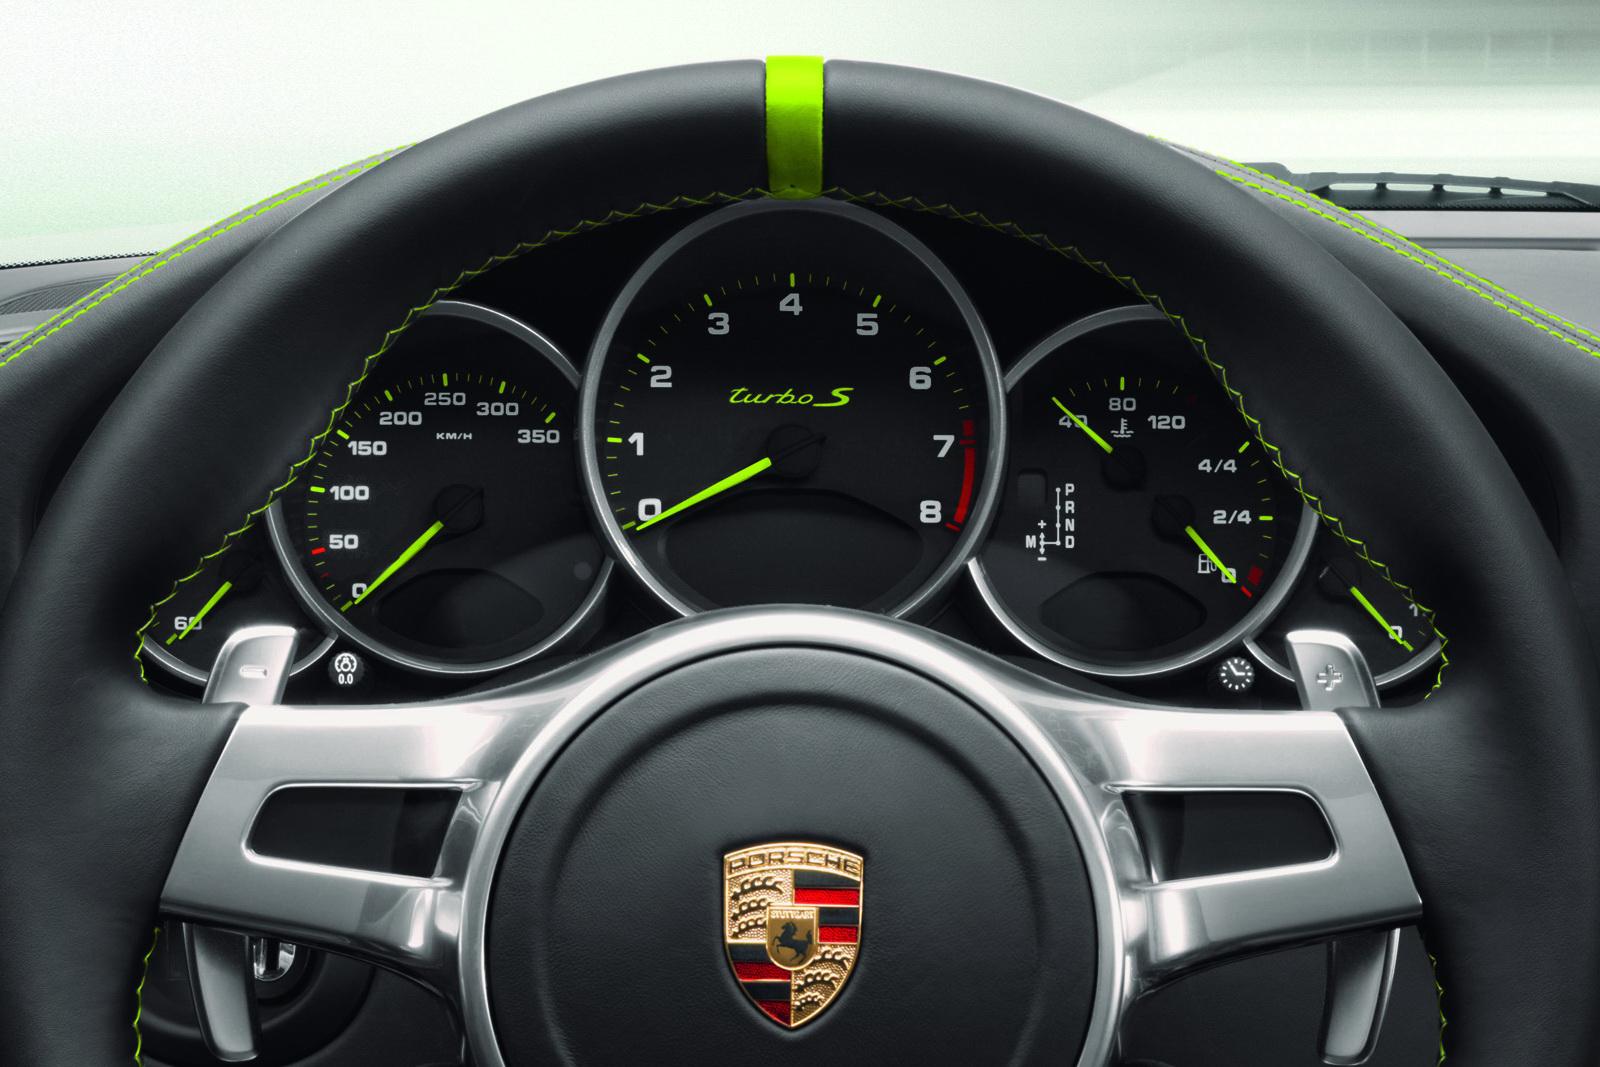 Automotivegeneral Porsche 911 Turbo S 918 Spyder Interior Wallpapers